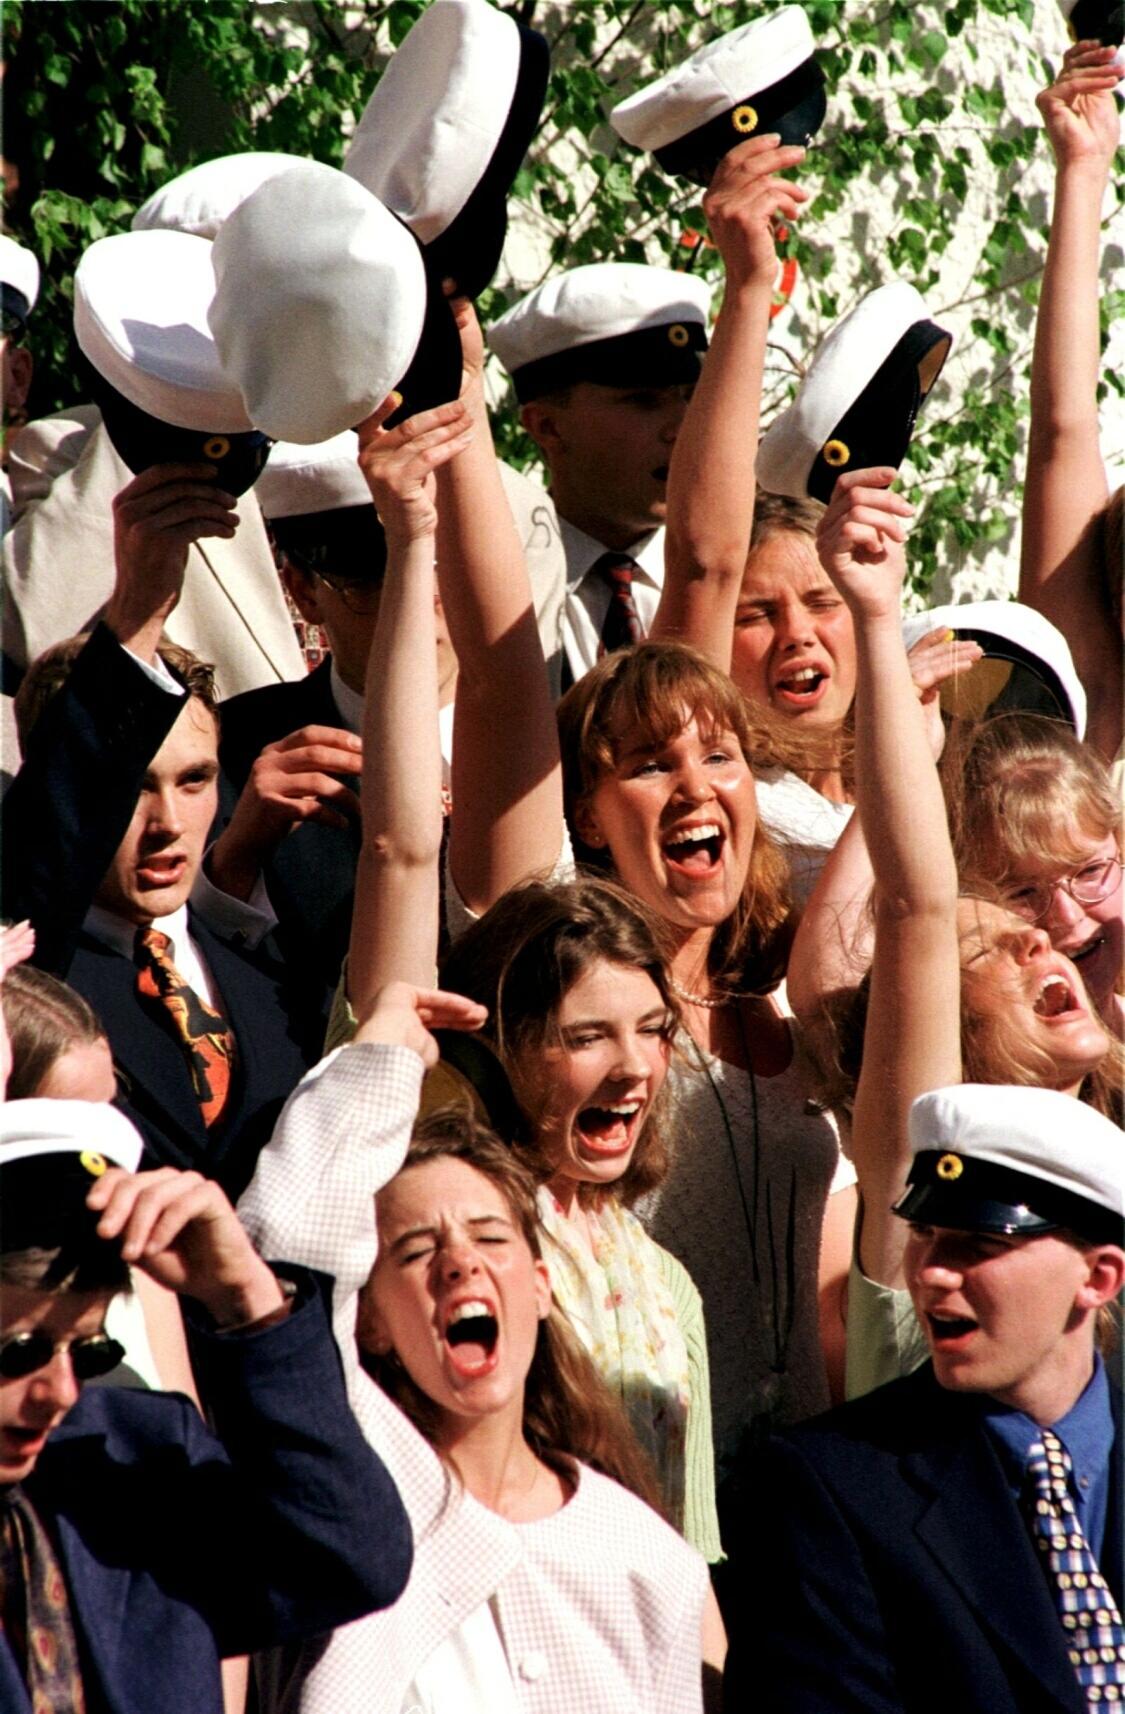 Studentmössor i skyn på Torsås korrespondensgymnasium 1996.